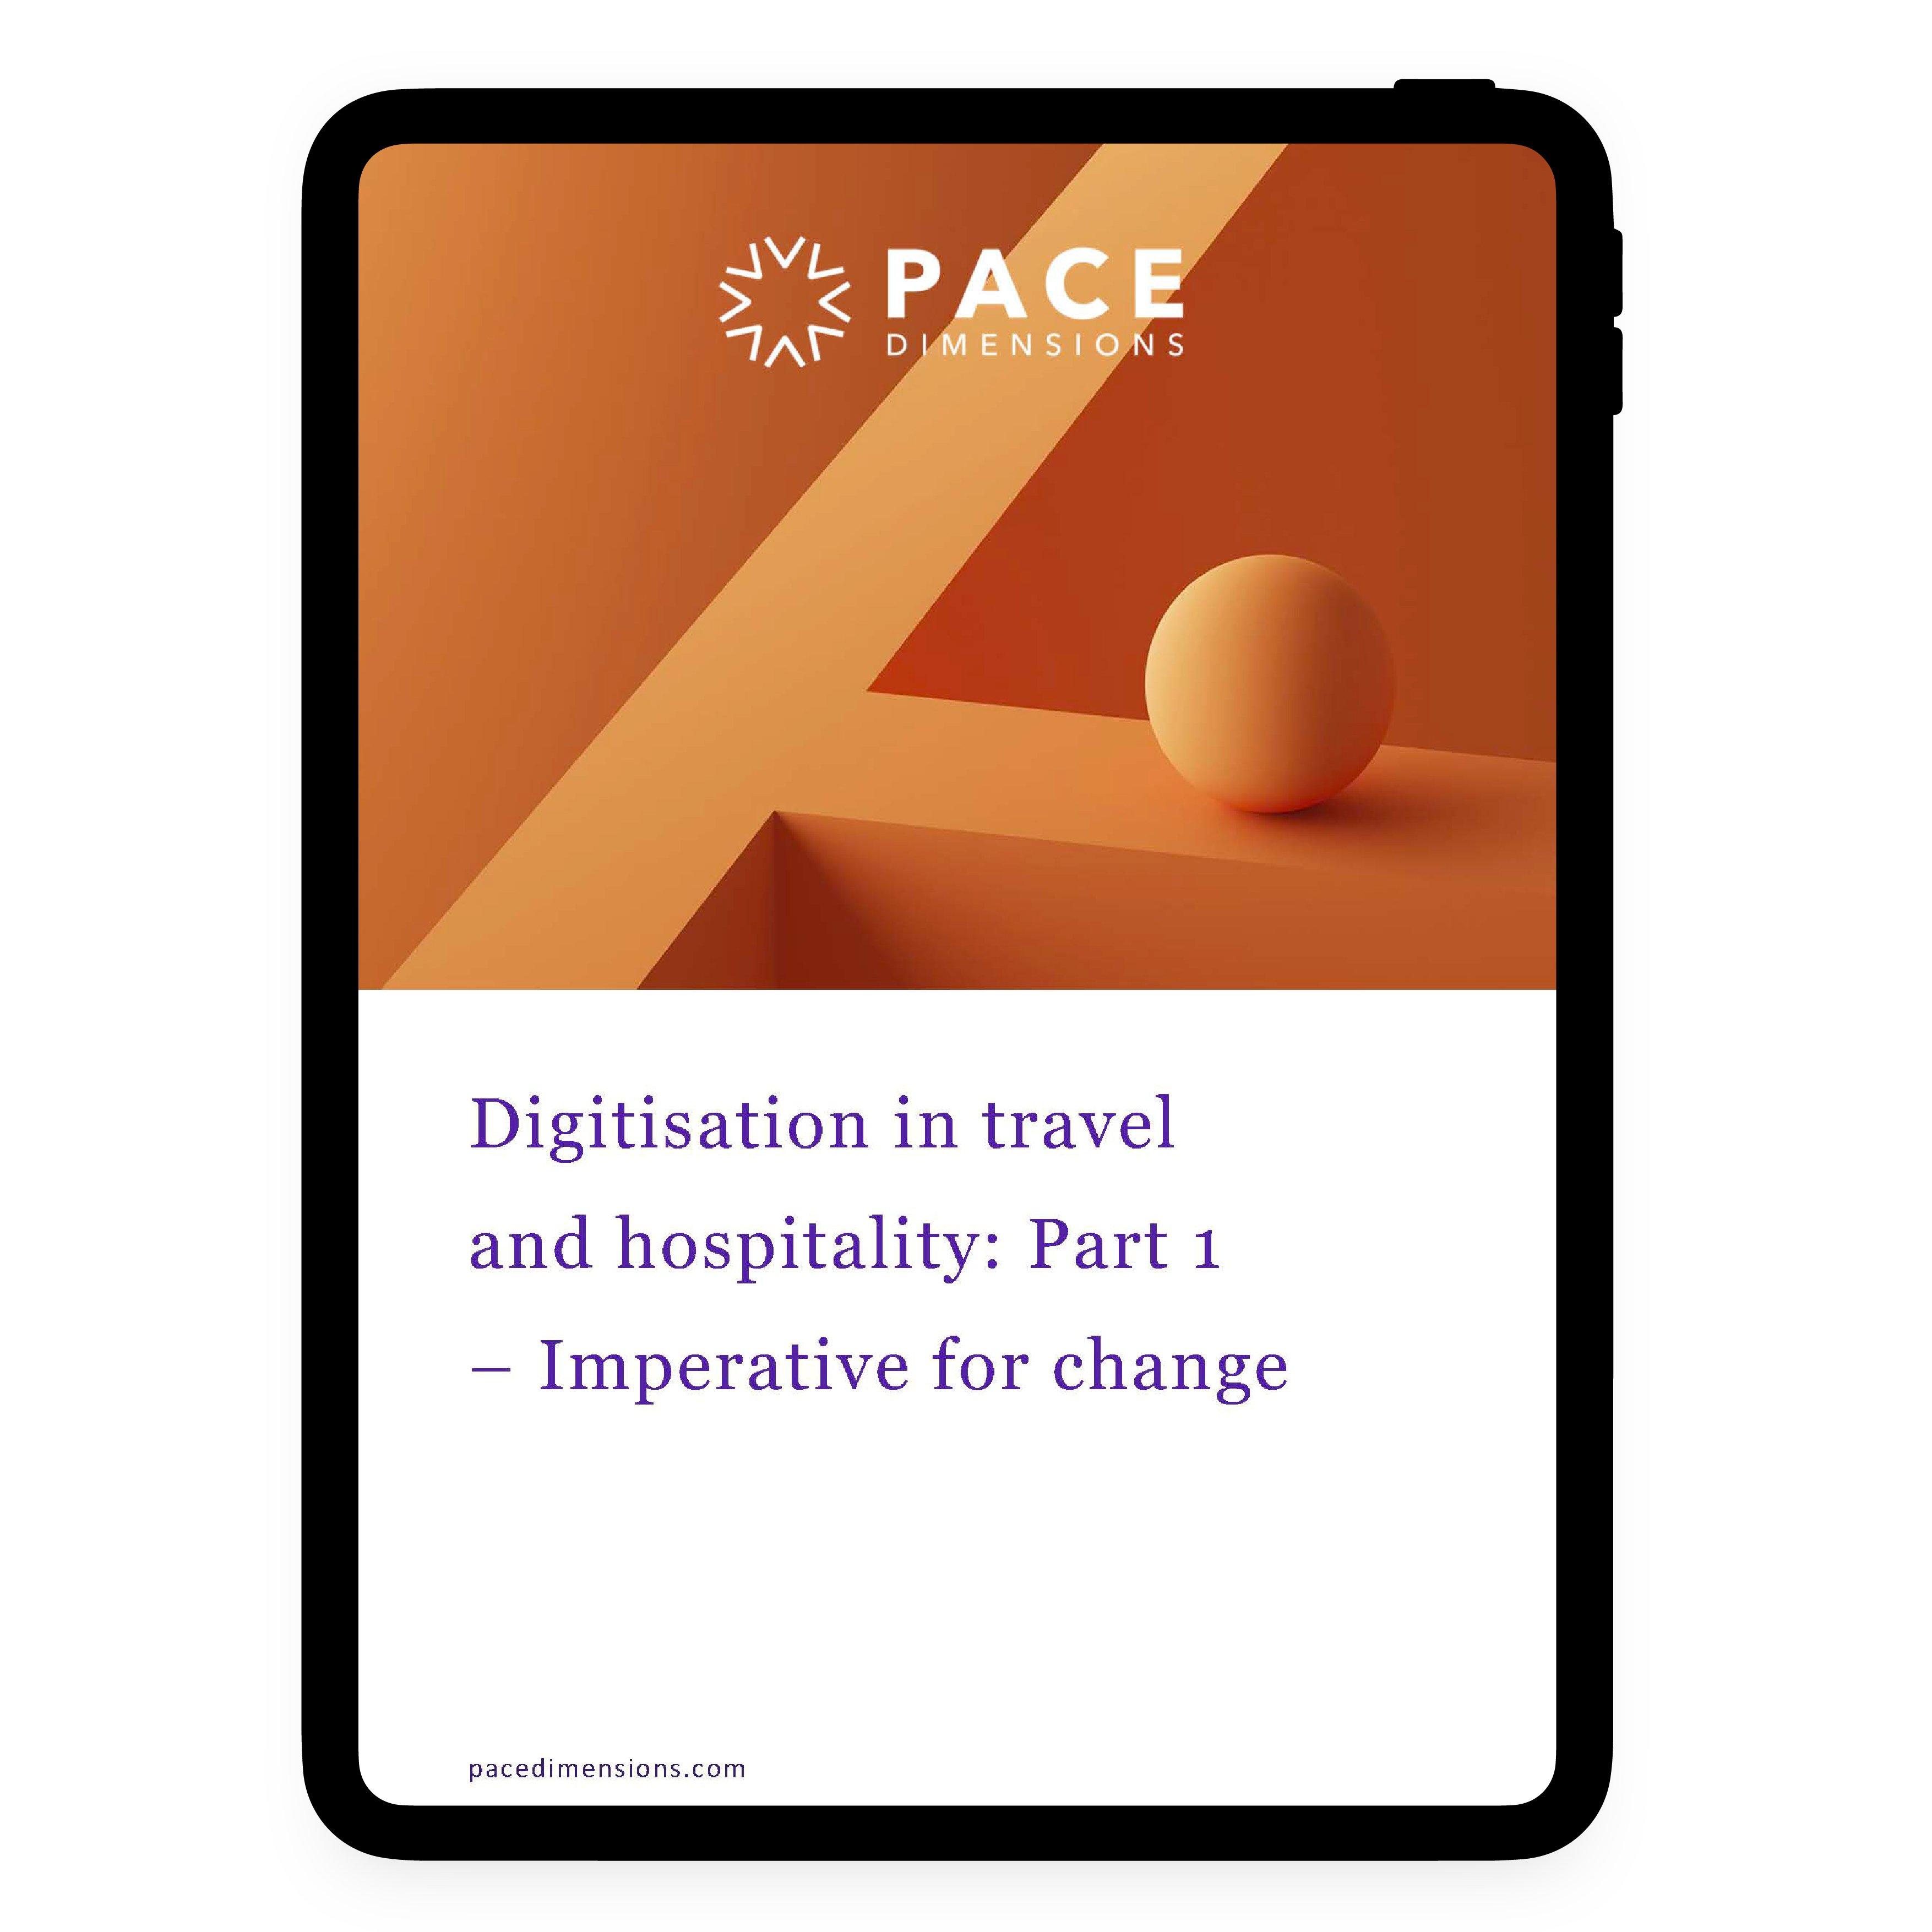 digitisation-travel-hospitality-part-1-whitepaper